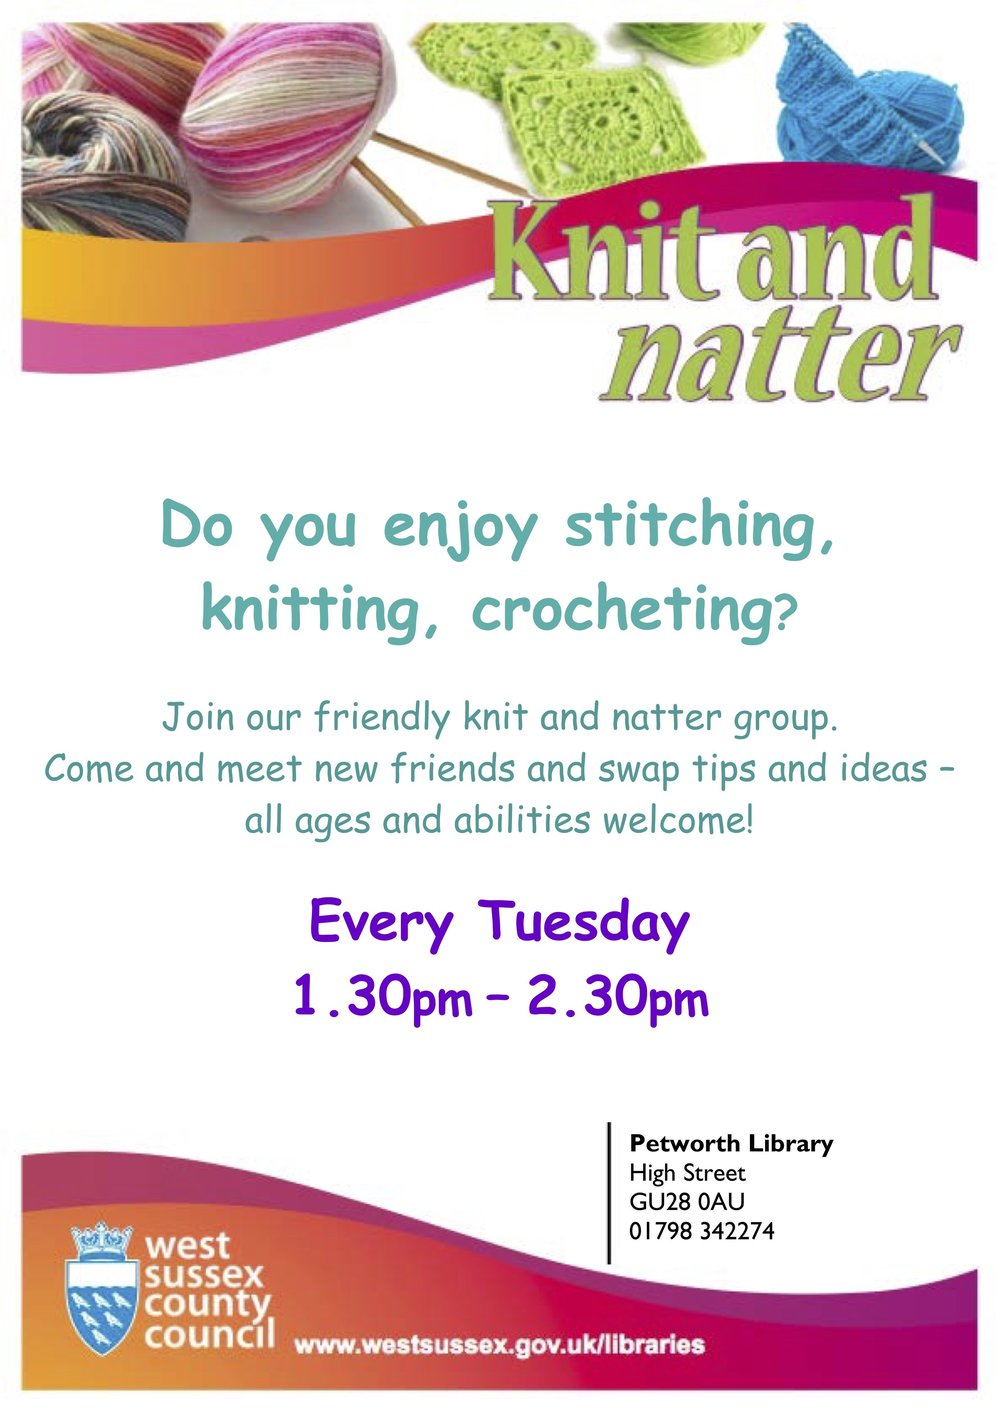 Knit and Natter at Petworth Library